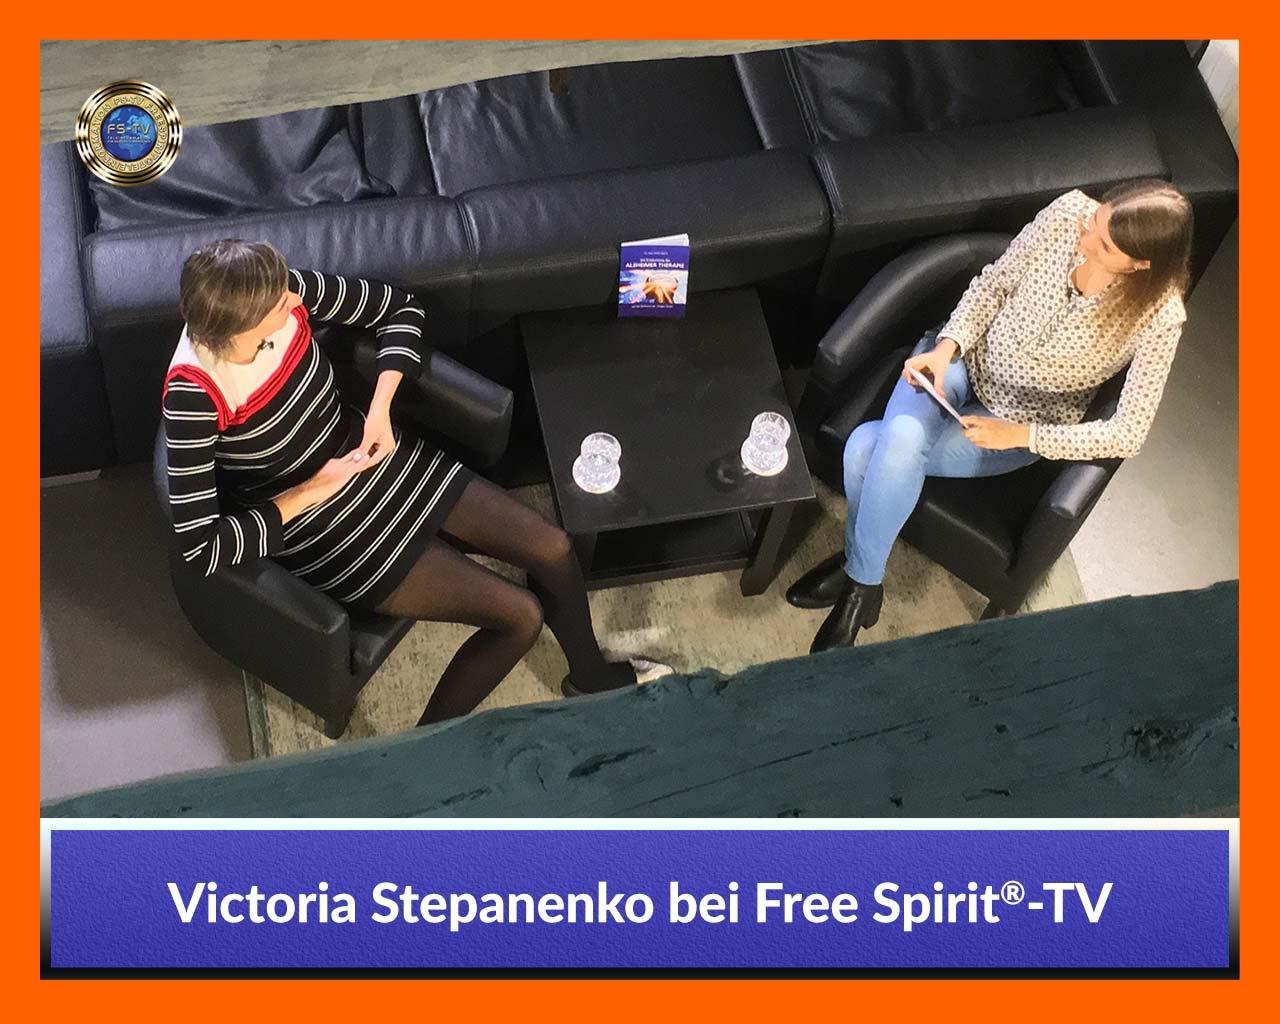 Galleriebild-Victoria-Stepanenko-10